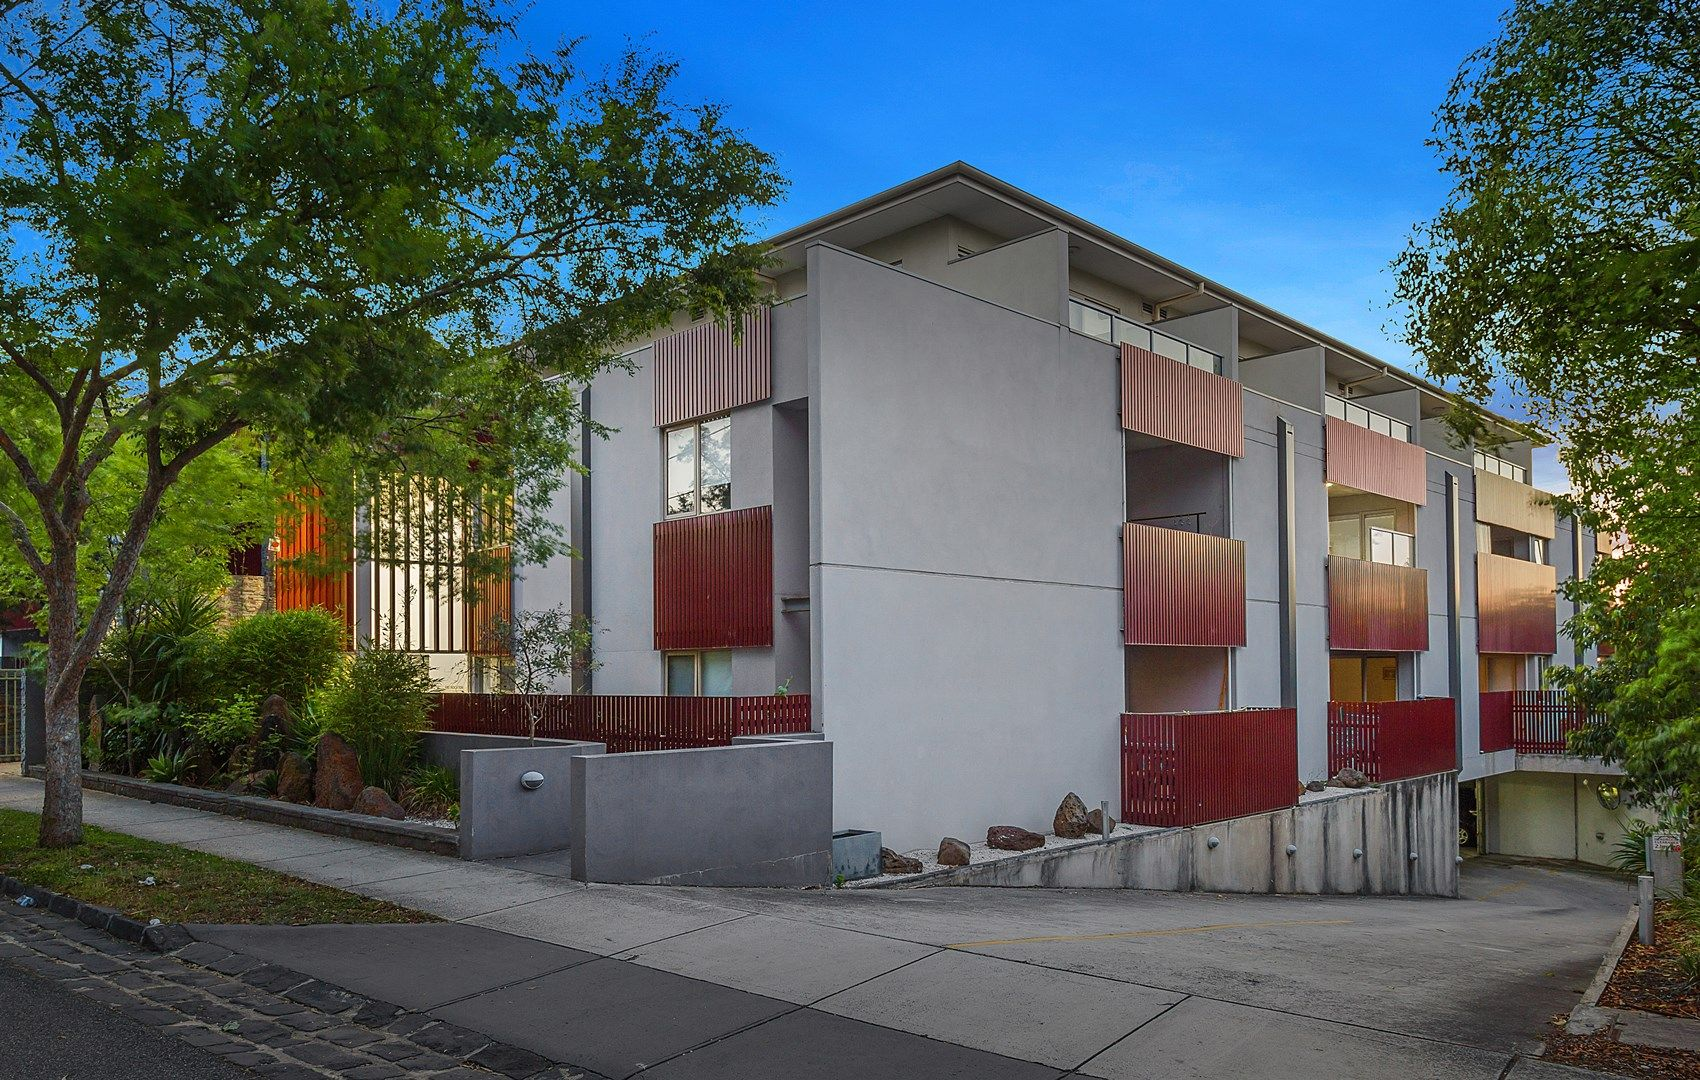 11/37-39 Rose Street, Box Hill VIC 3128, Image 0